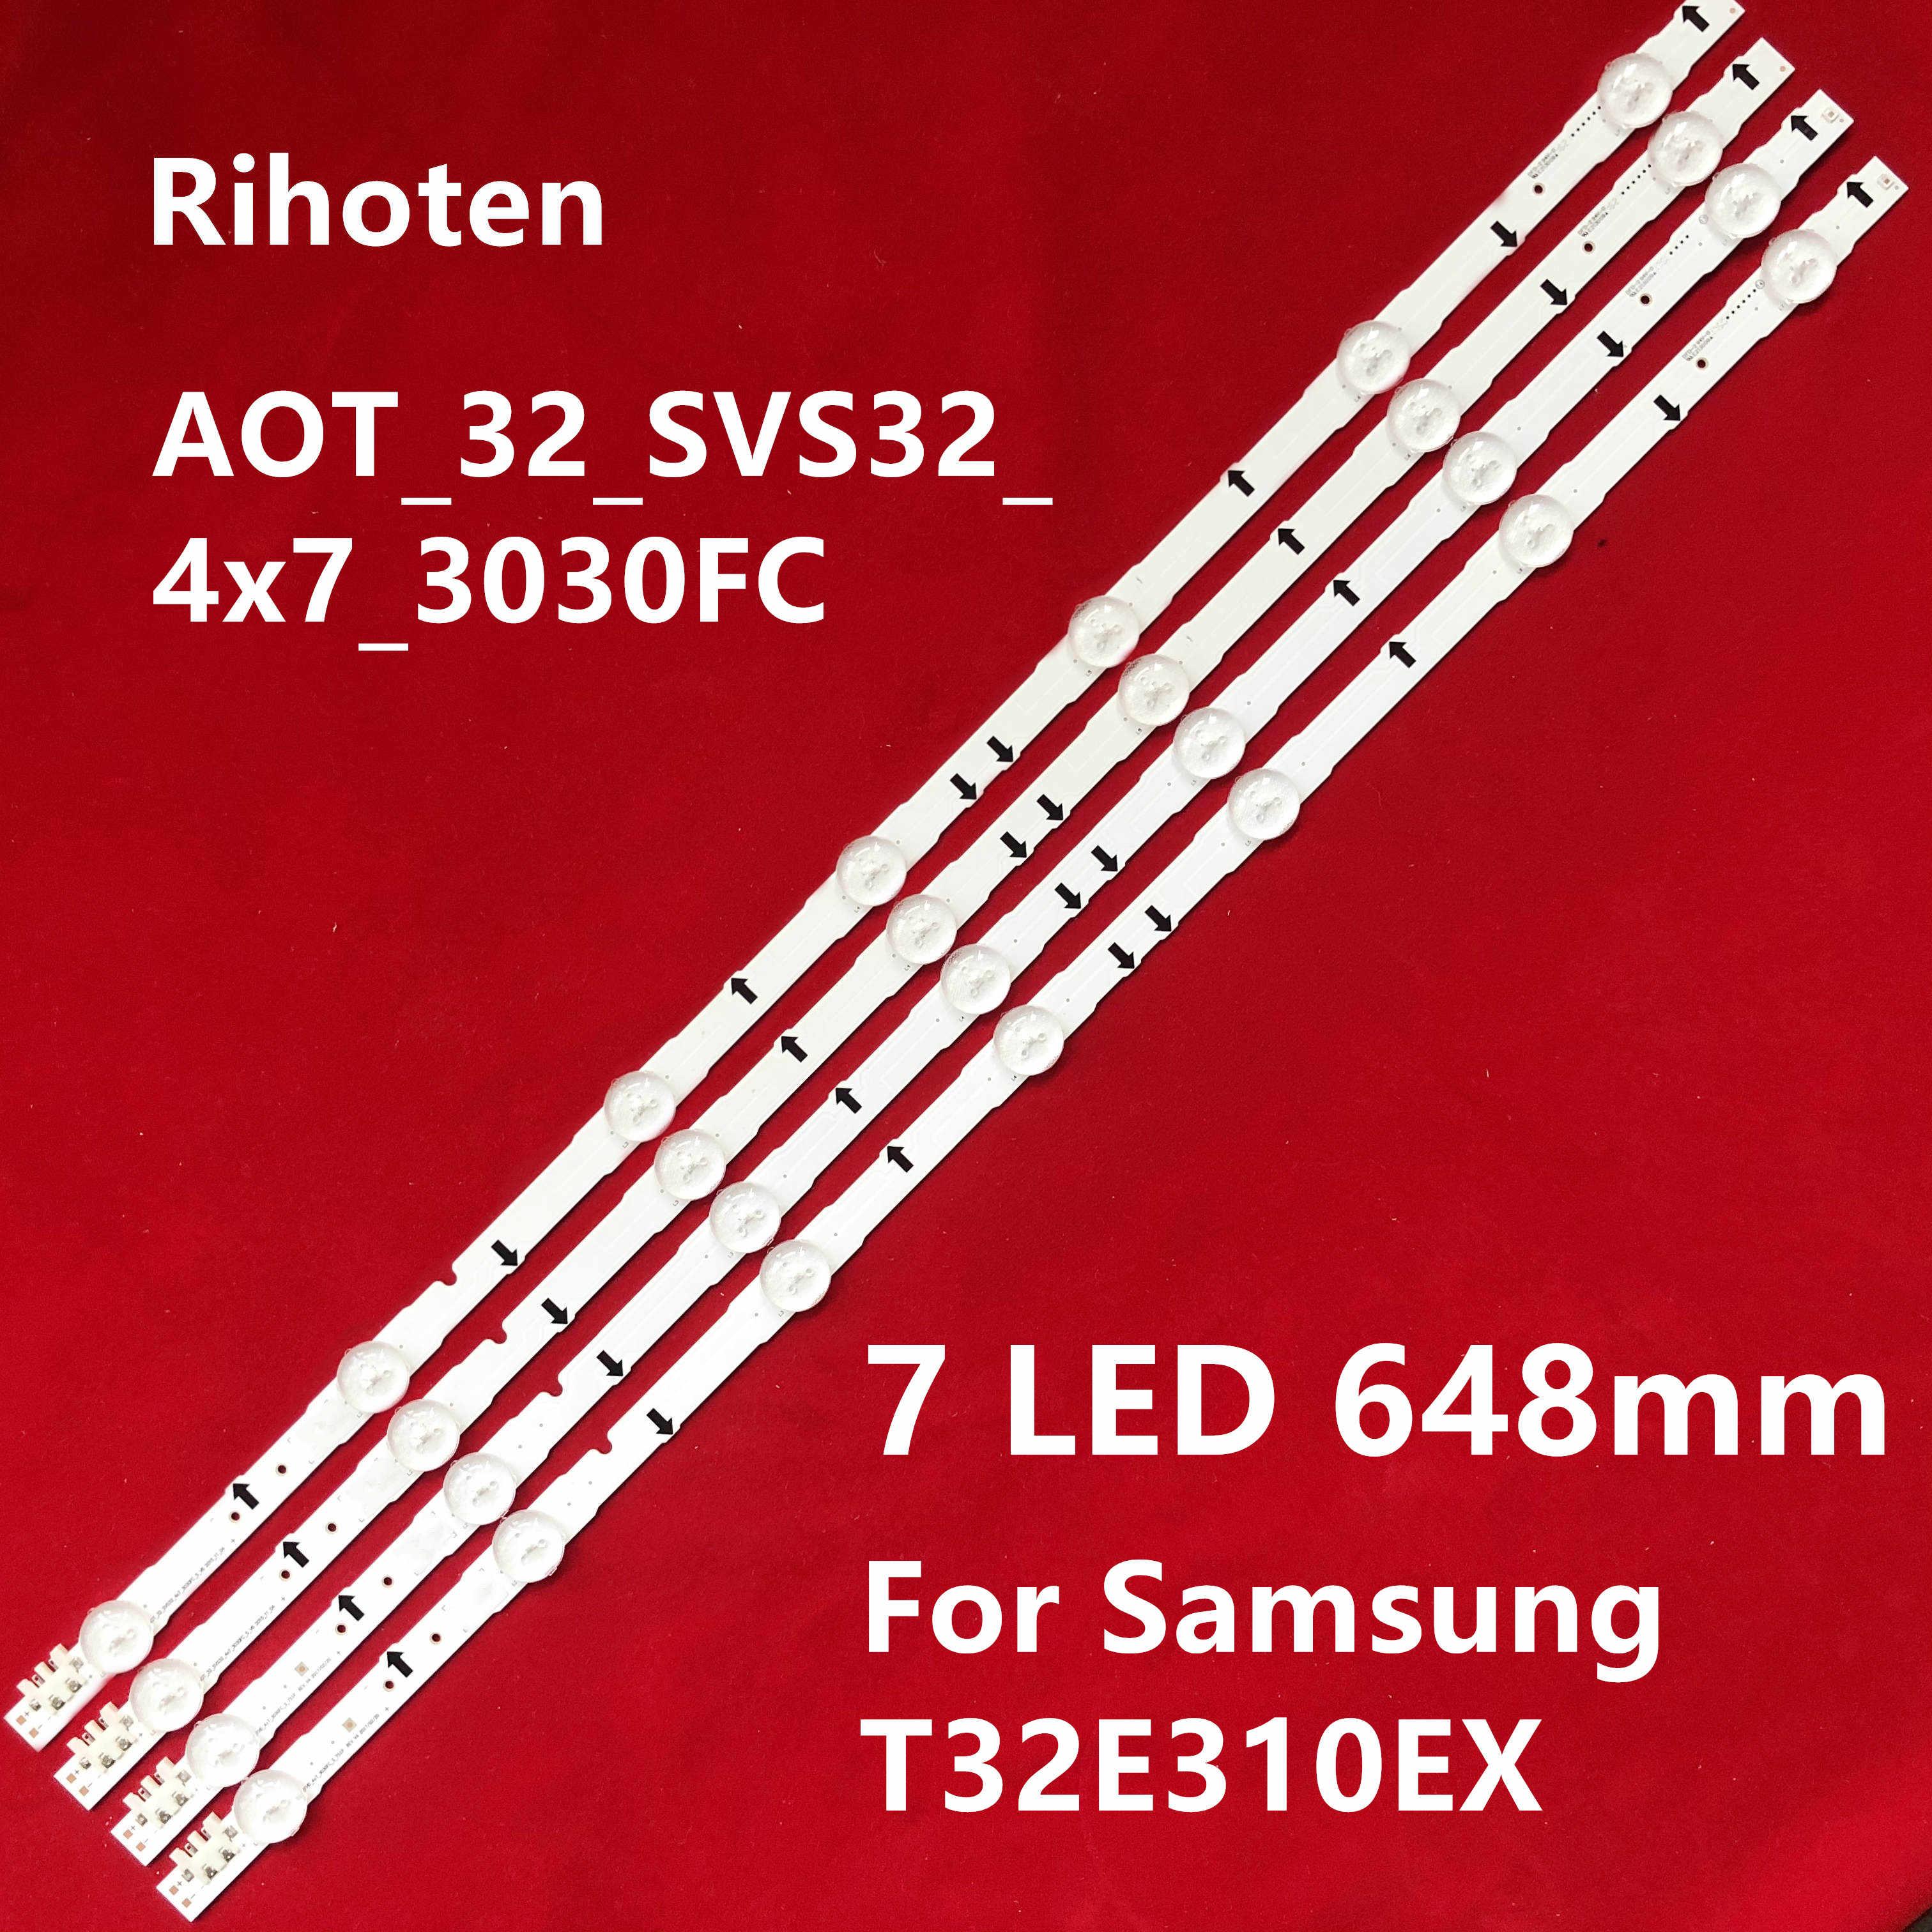 1 Set = 4 Stuks Led Backlight Strip AOT_32_SVS32_4x7_3030FC_SV6 Voor Samsung T32E310EX 7 Lampen 648 Mm